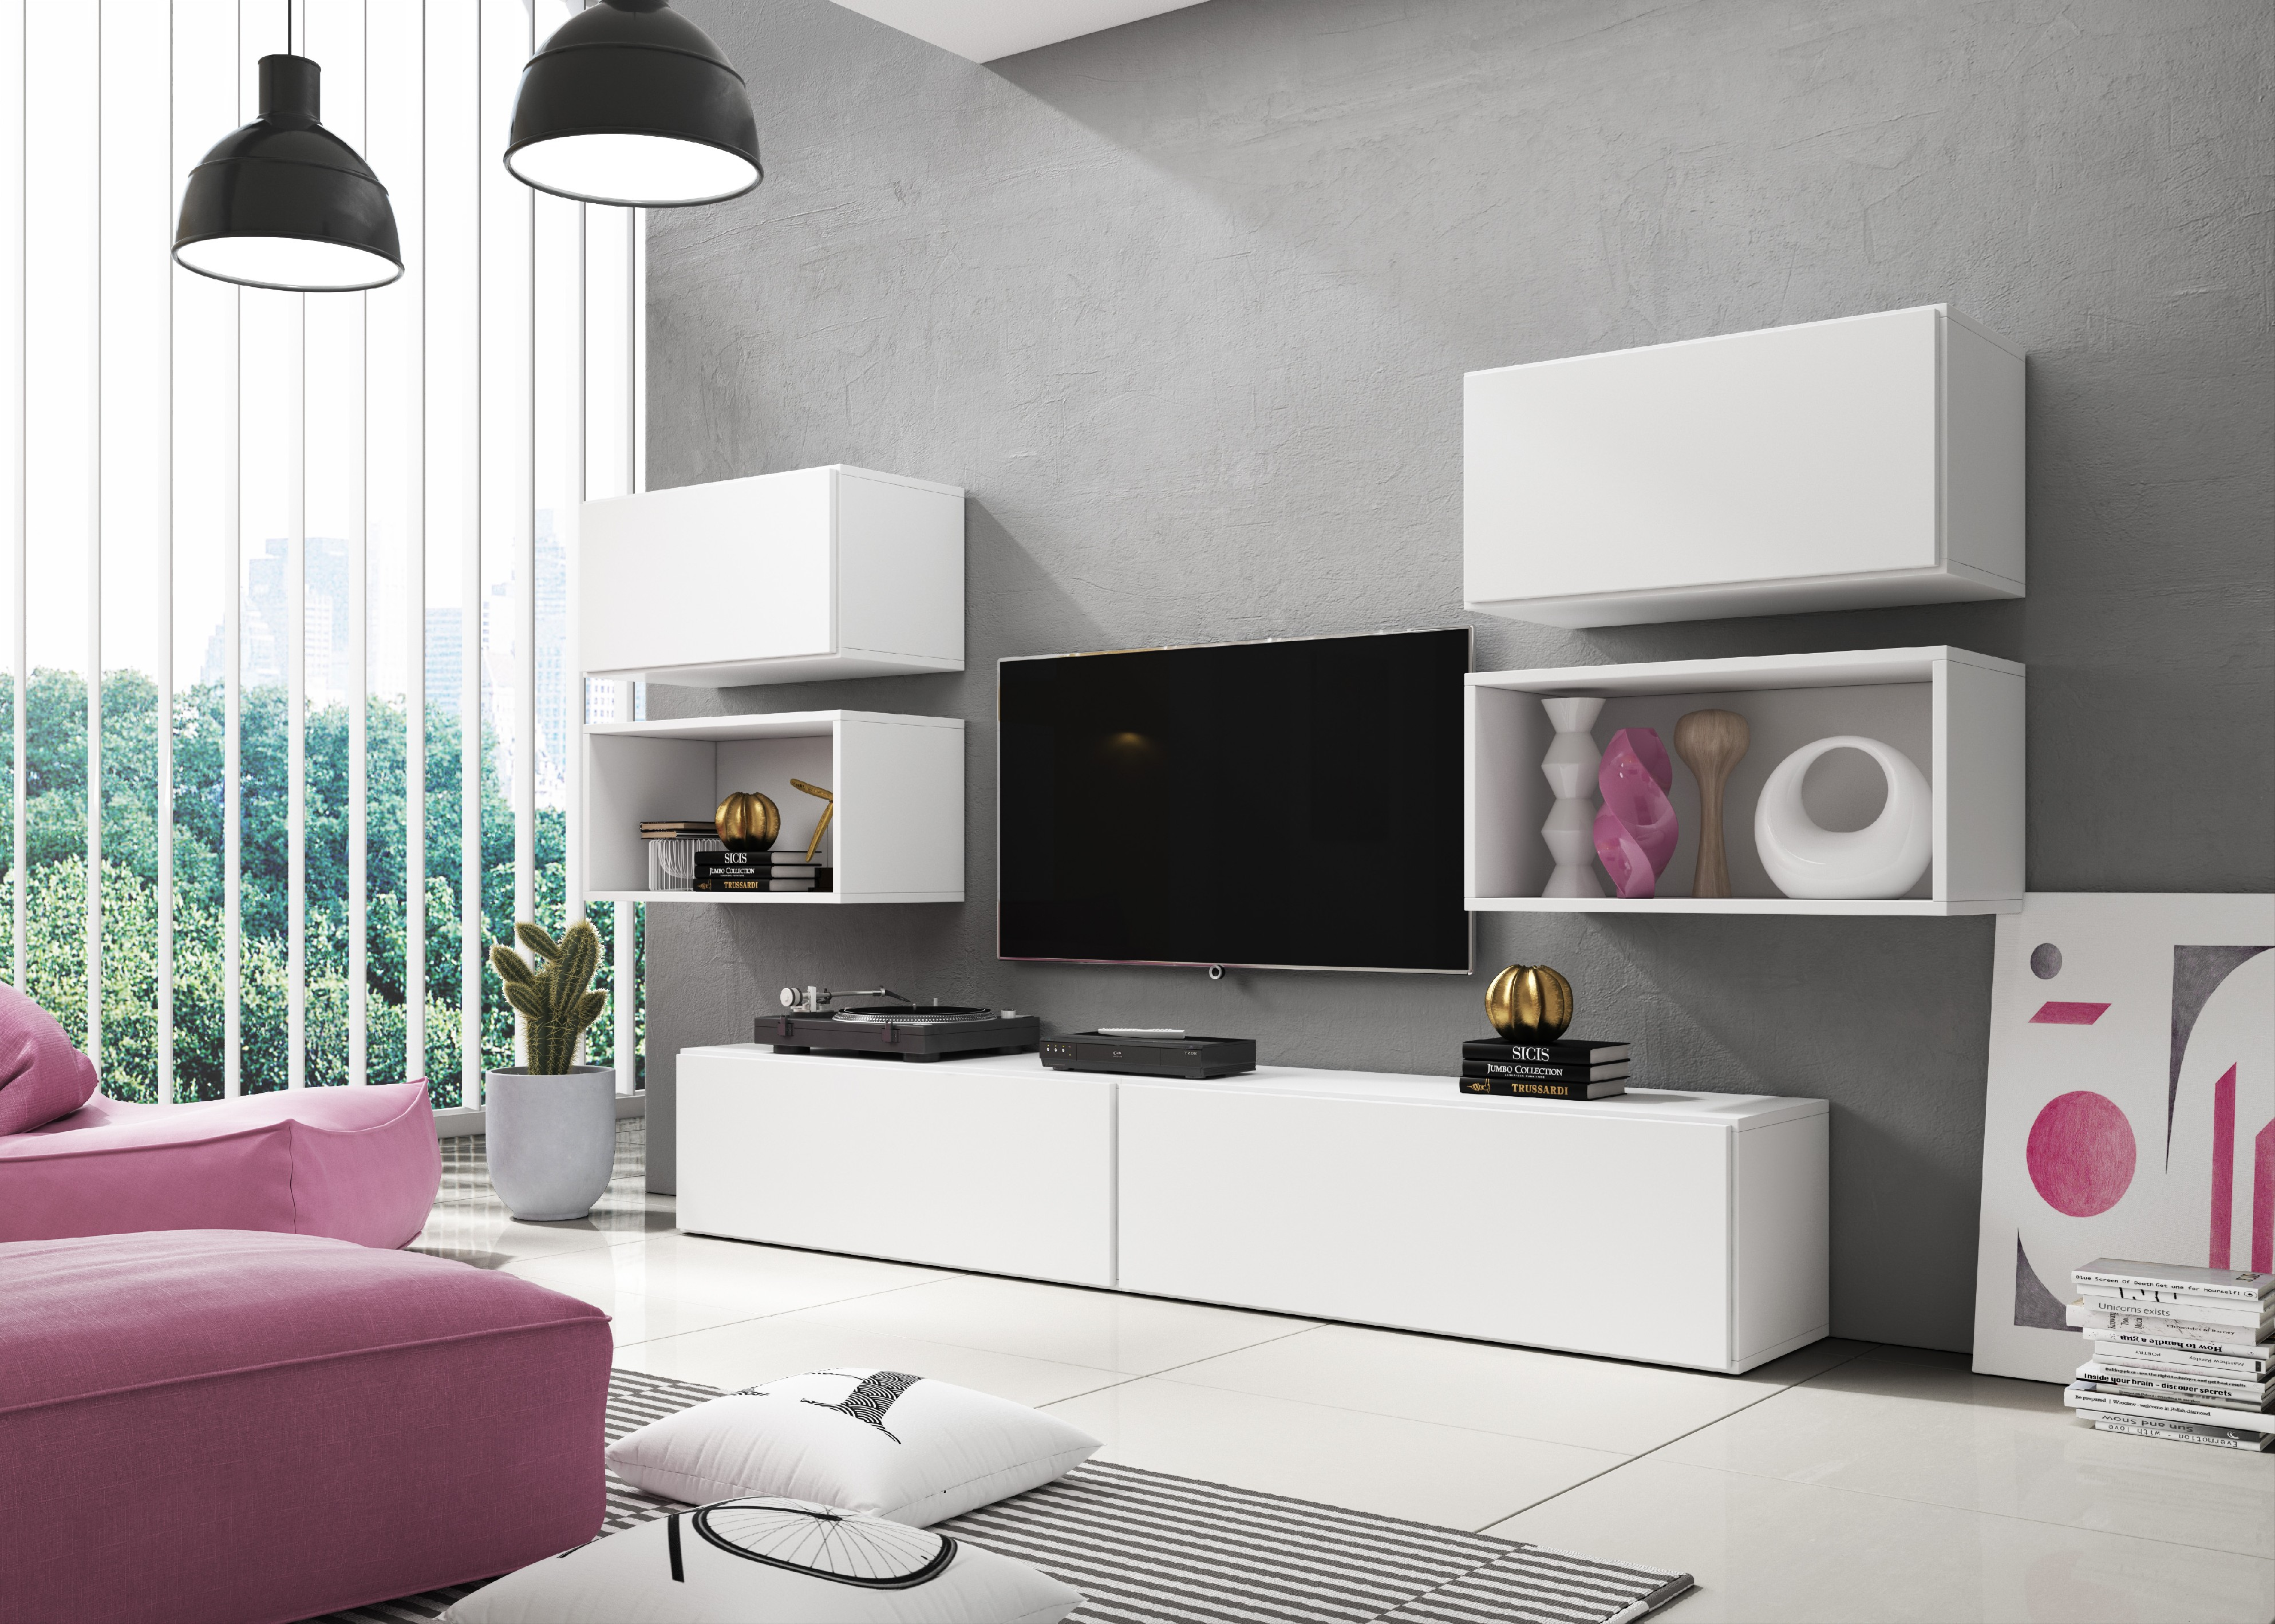 Artcam Obývacia stena ROCO 3 roco: korpus biely mat / okraj biely mat / dvierka biely mat